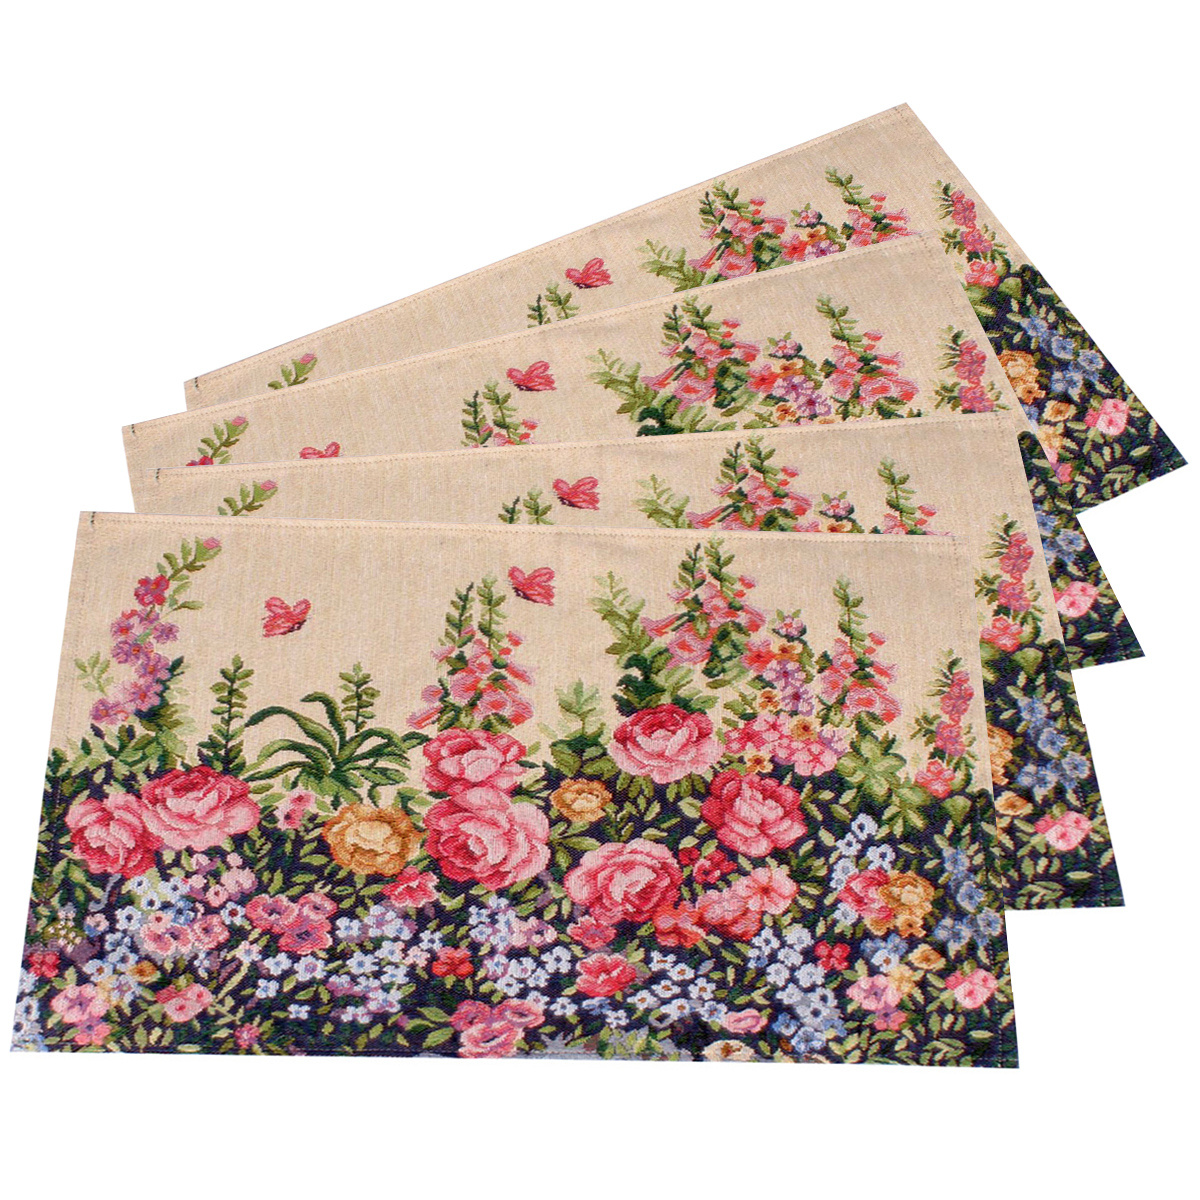 Dakls Prostírání Flowers, 33 x 48 cm, sada 4 ks